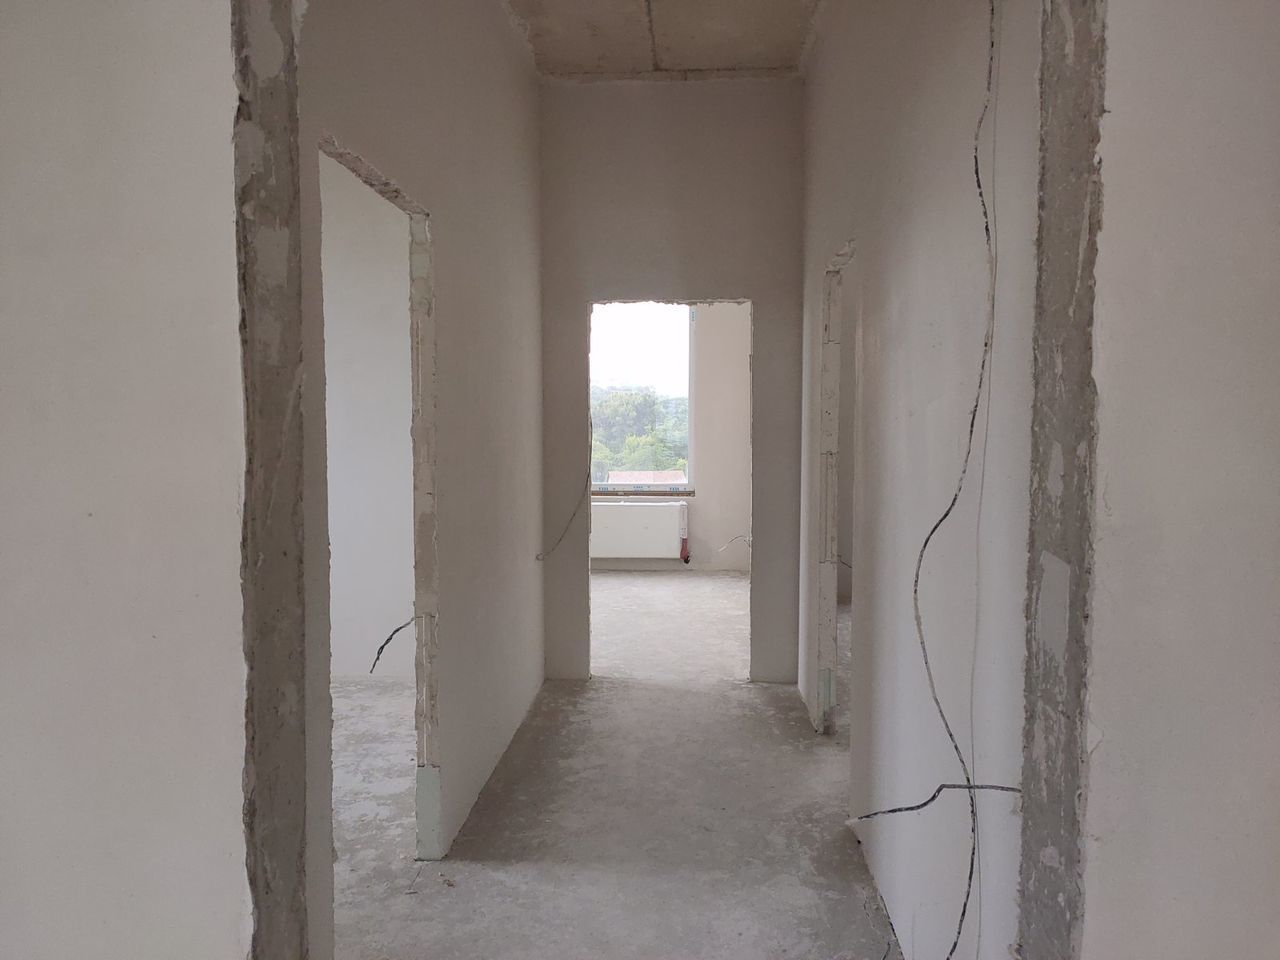 Penthouse cu 3 odai, suprafața 146,5 m2 !! sect. Botanica, str.Vorniceni